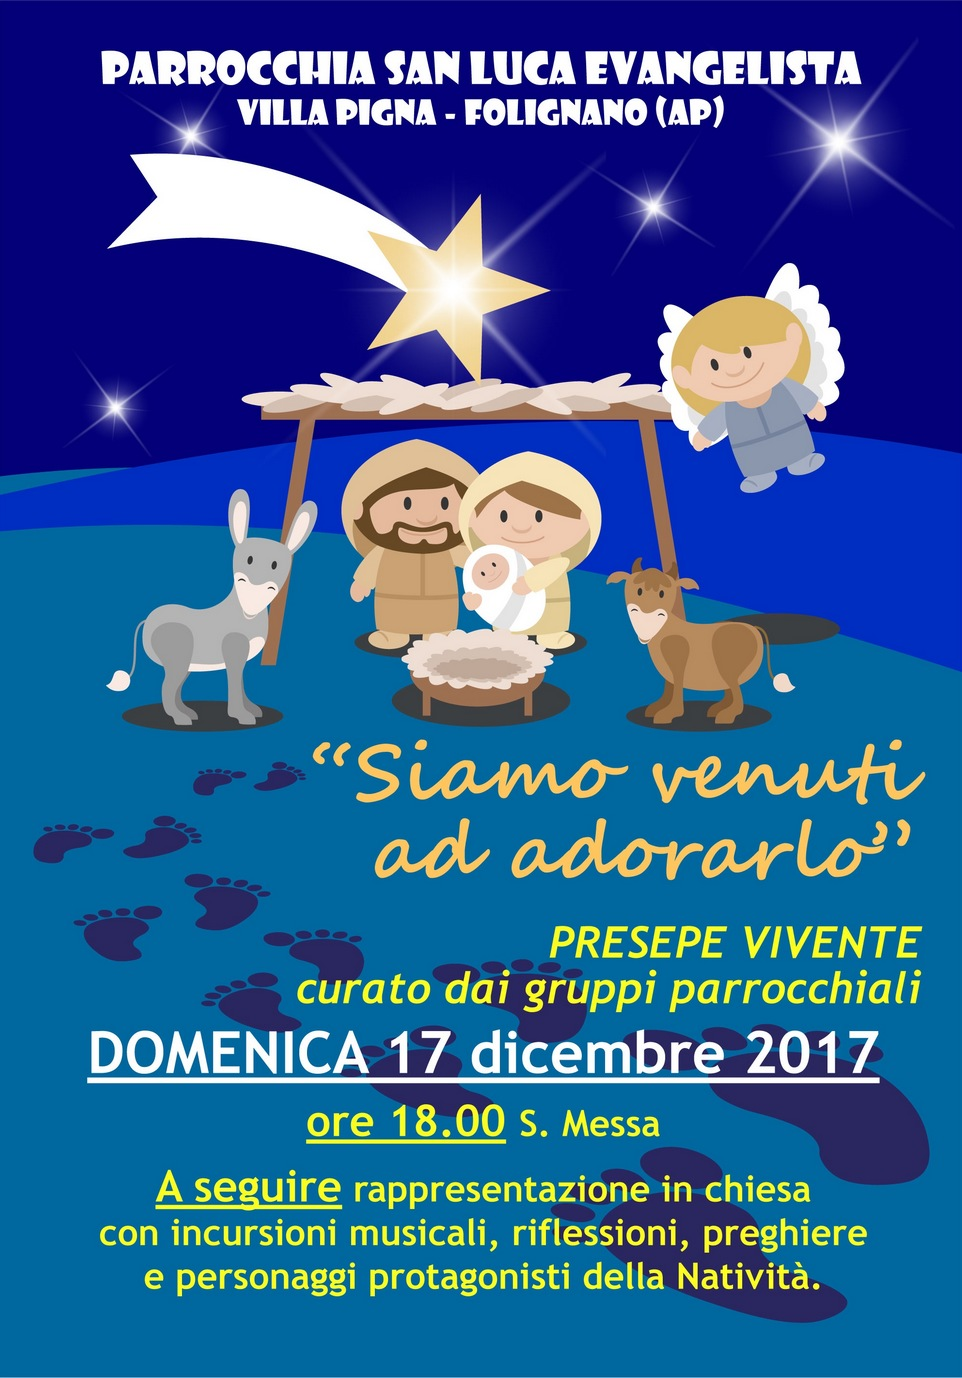 _Locandina_presepe_Vivente_Parrocchia_2017